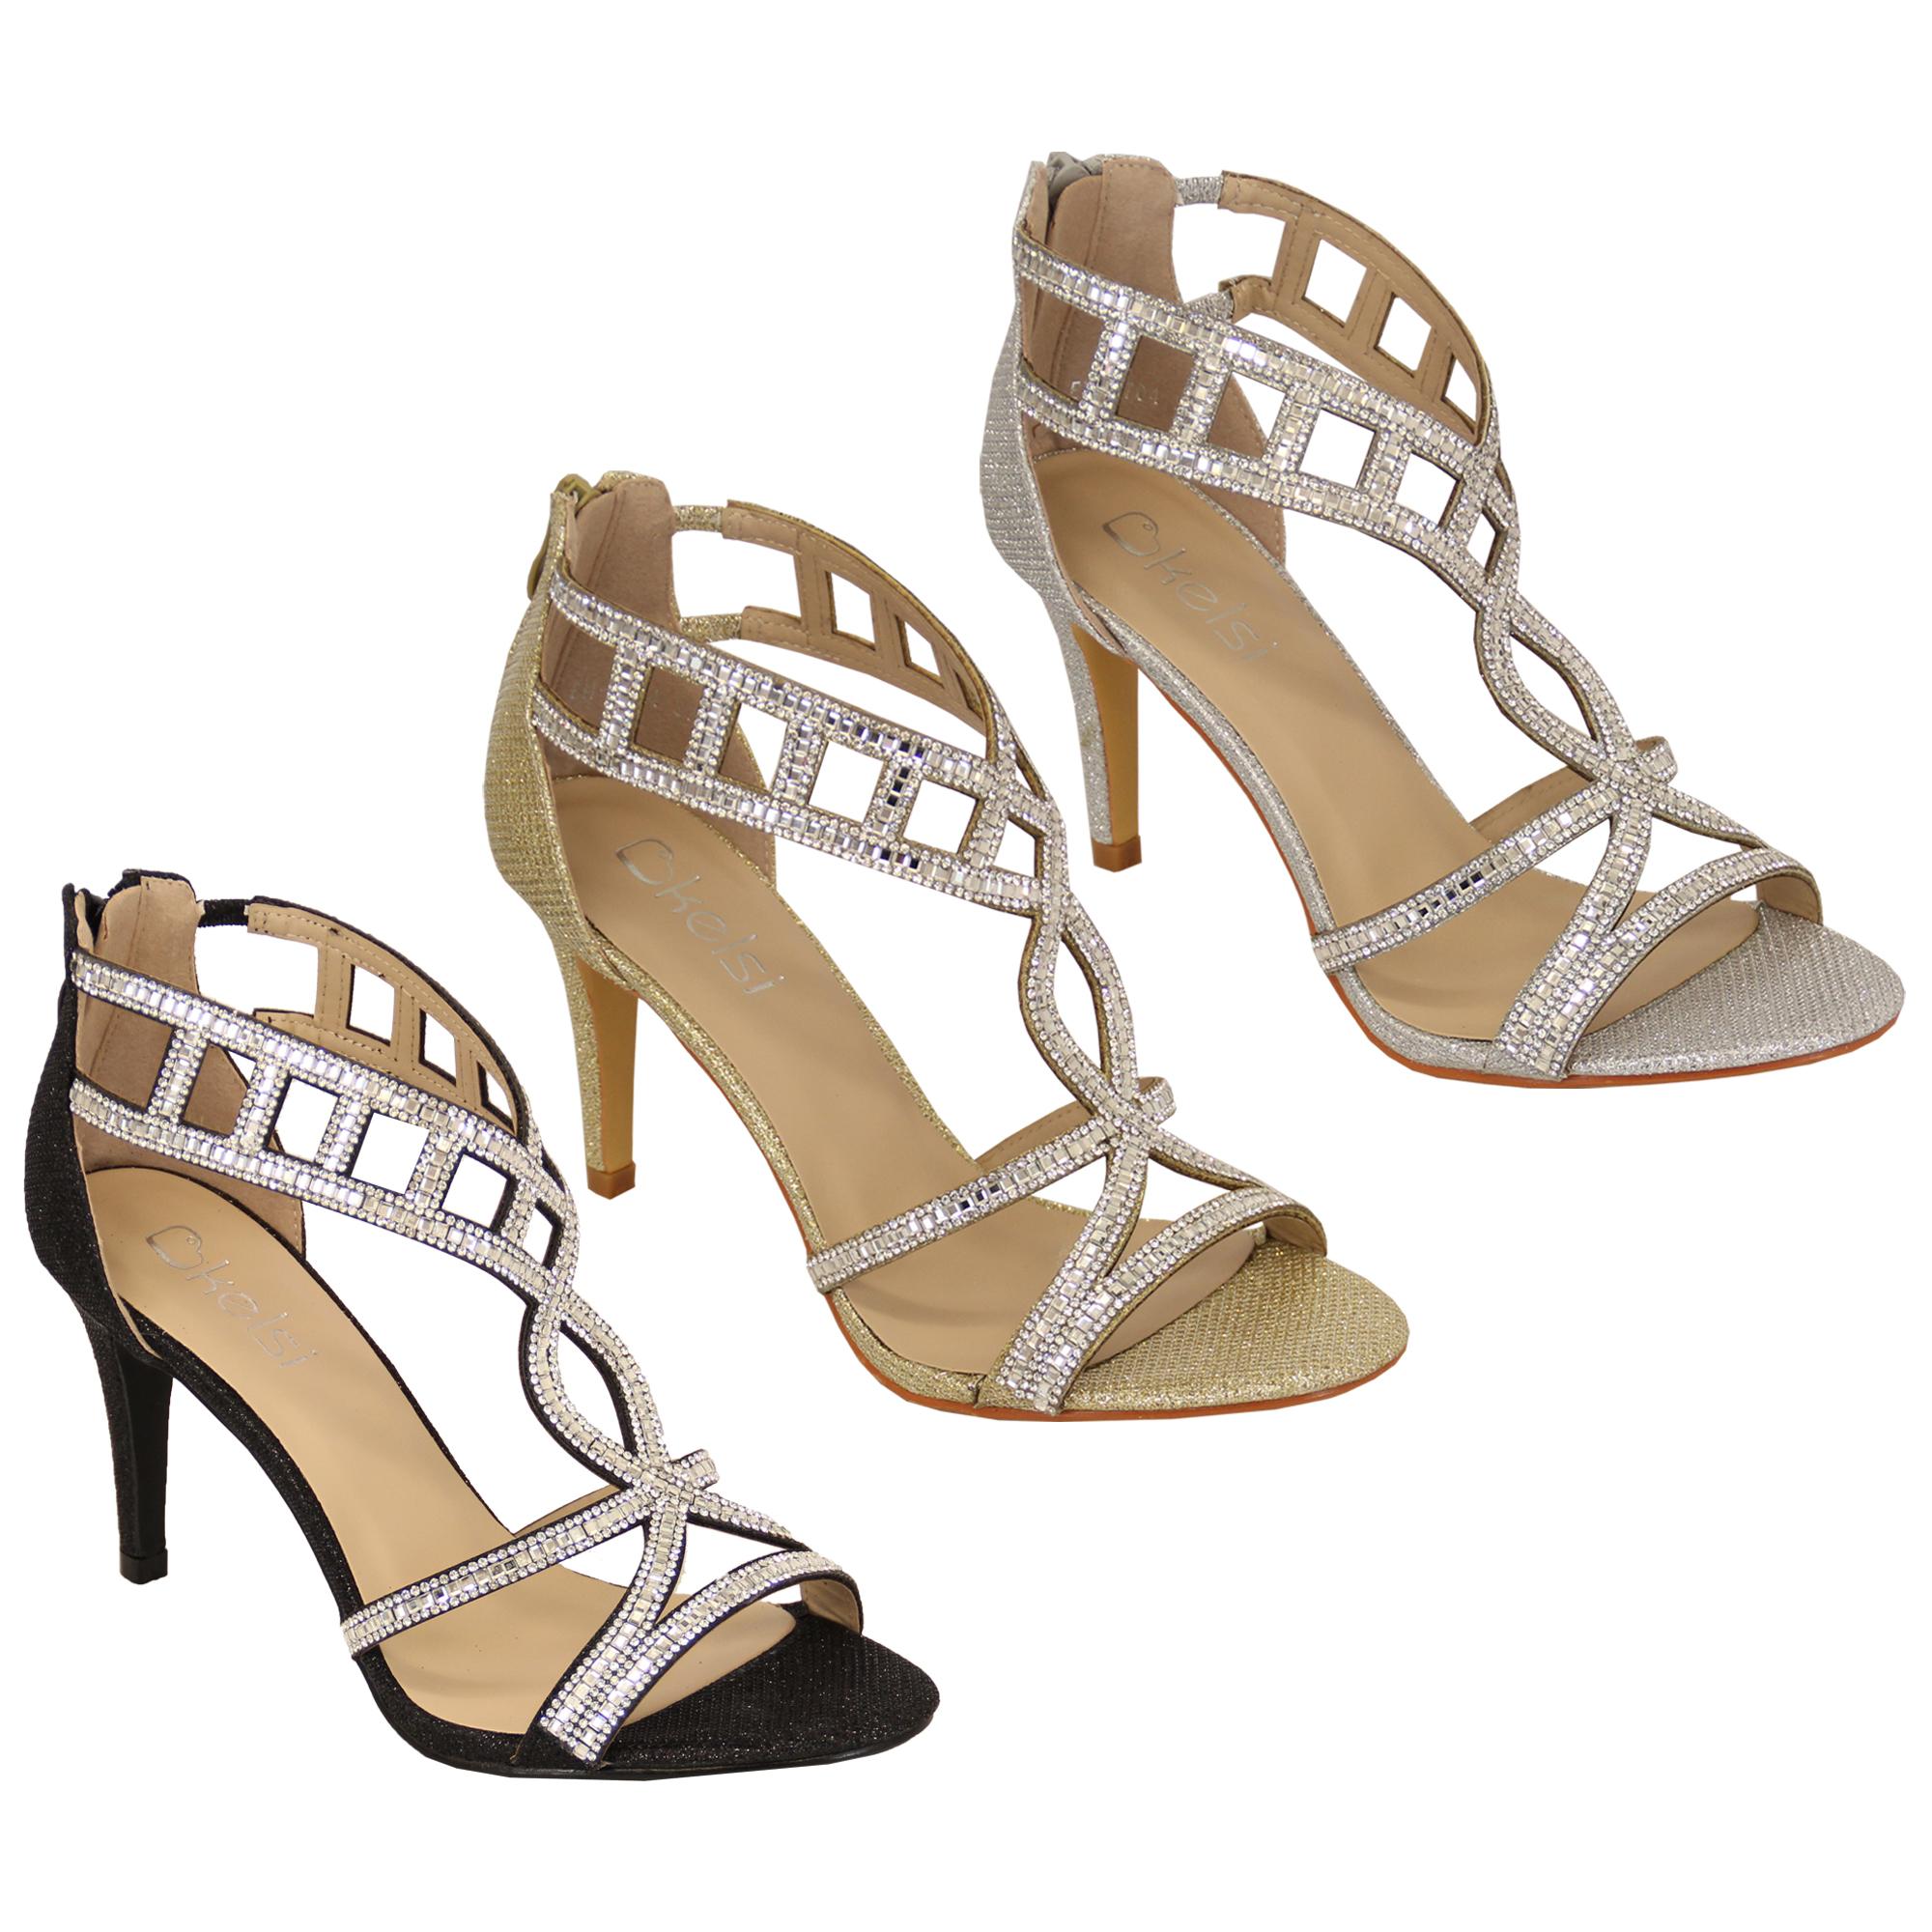 f268d1b2b Details about ladies sandals Kelsi womens ankle glitter diamante pencil  heel open toe shoes